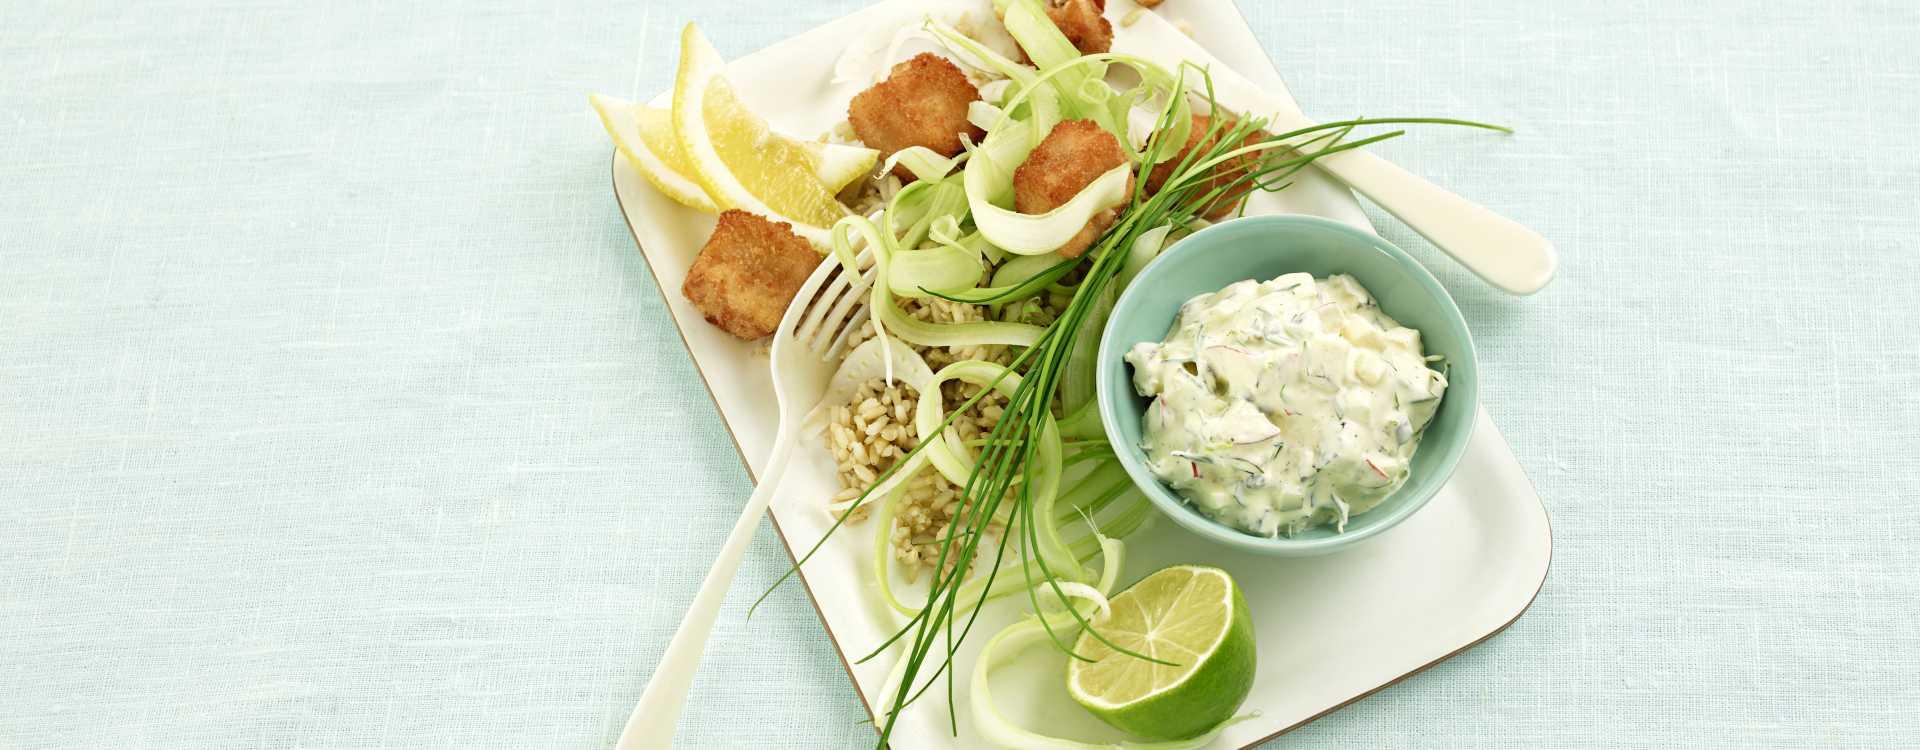 Pankopanerte torskenuggets med remulade, salat og ris